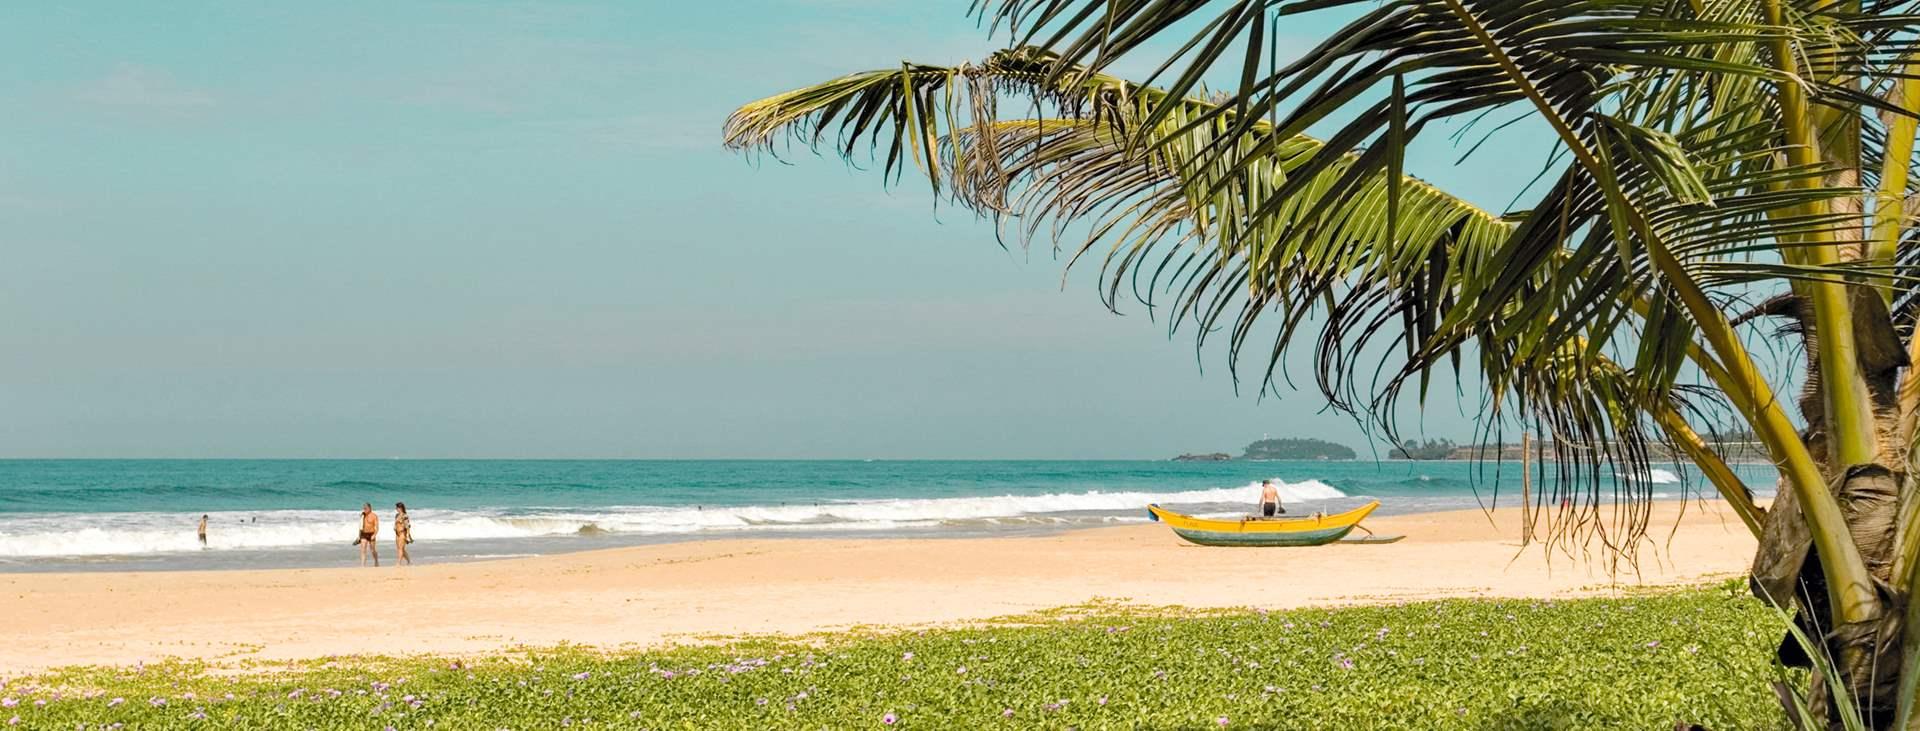 Boka din resa till Bentota i Sri Lanka med Ving